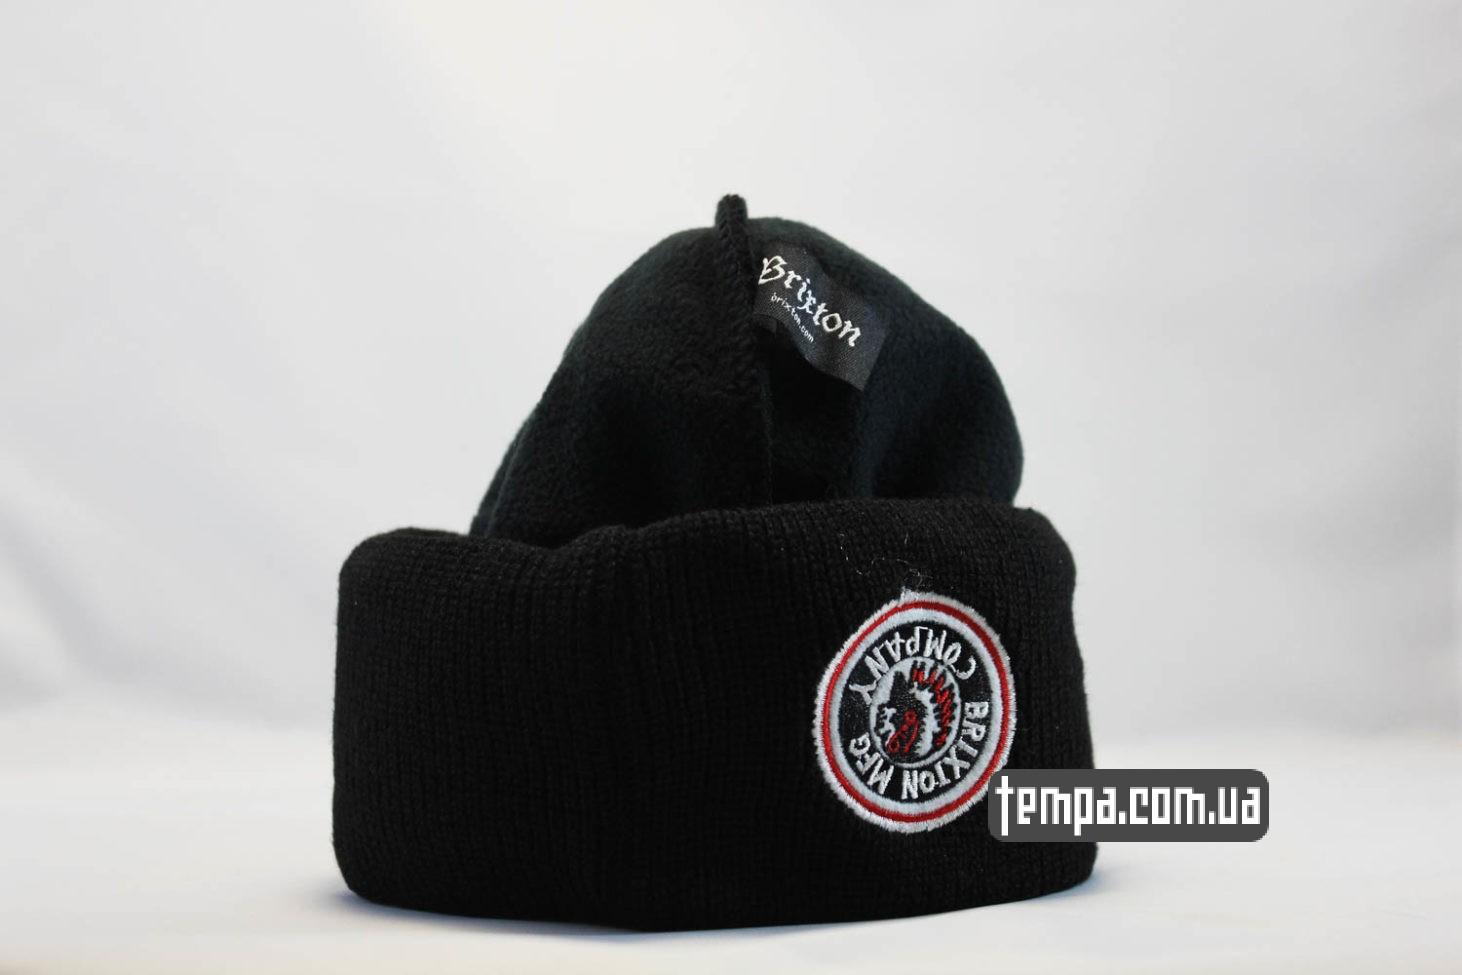 двойная теплая зимняя шапрка beanie BRIXTON mfg company черная с индейцем